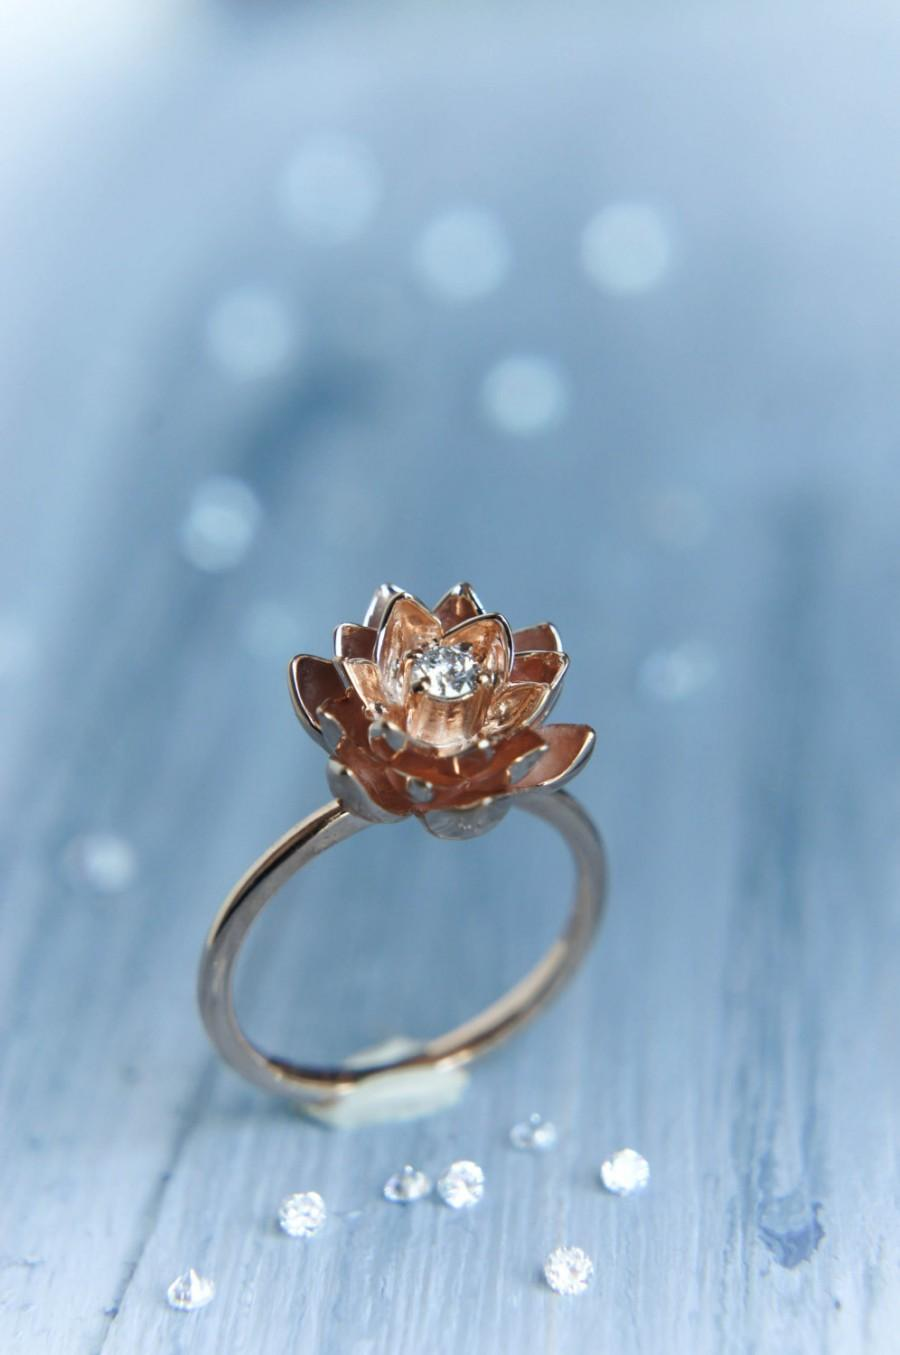 Mariage - 18K gold flower engagement ring, diamond ring, rose gold ring, unique engagement ring, proposal ring, lotus ring, gold ring, red gold ring